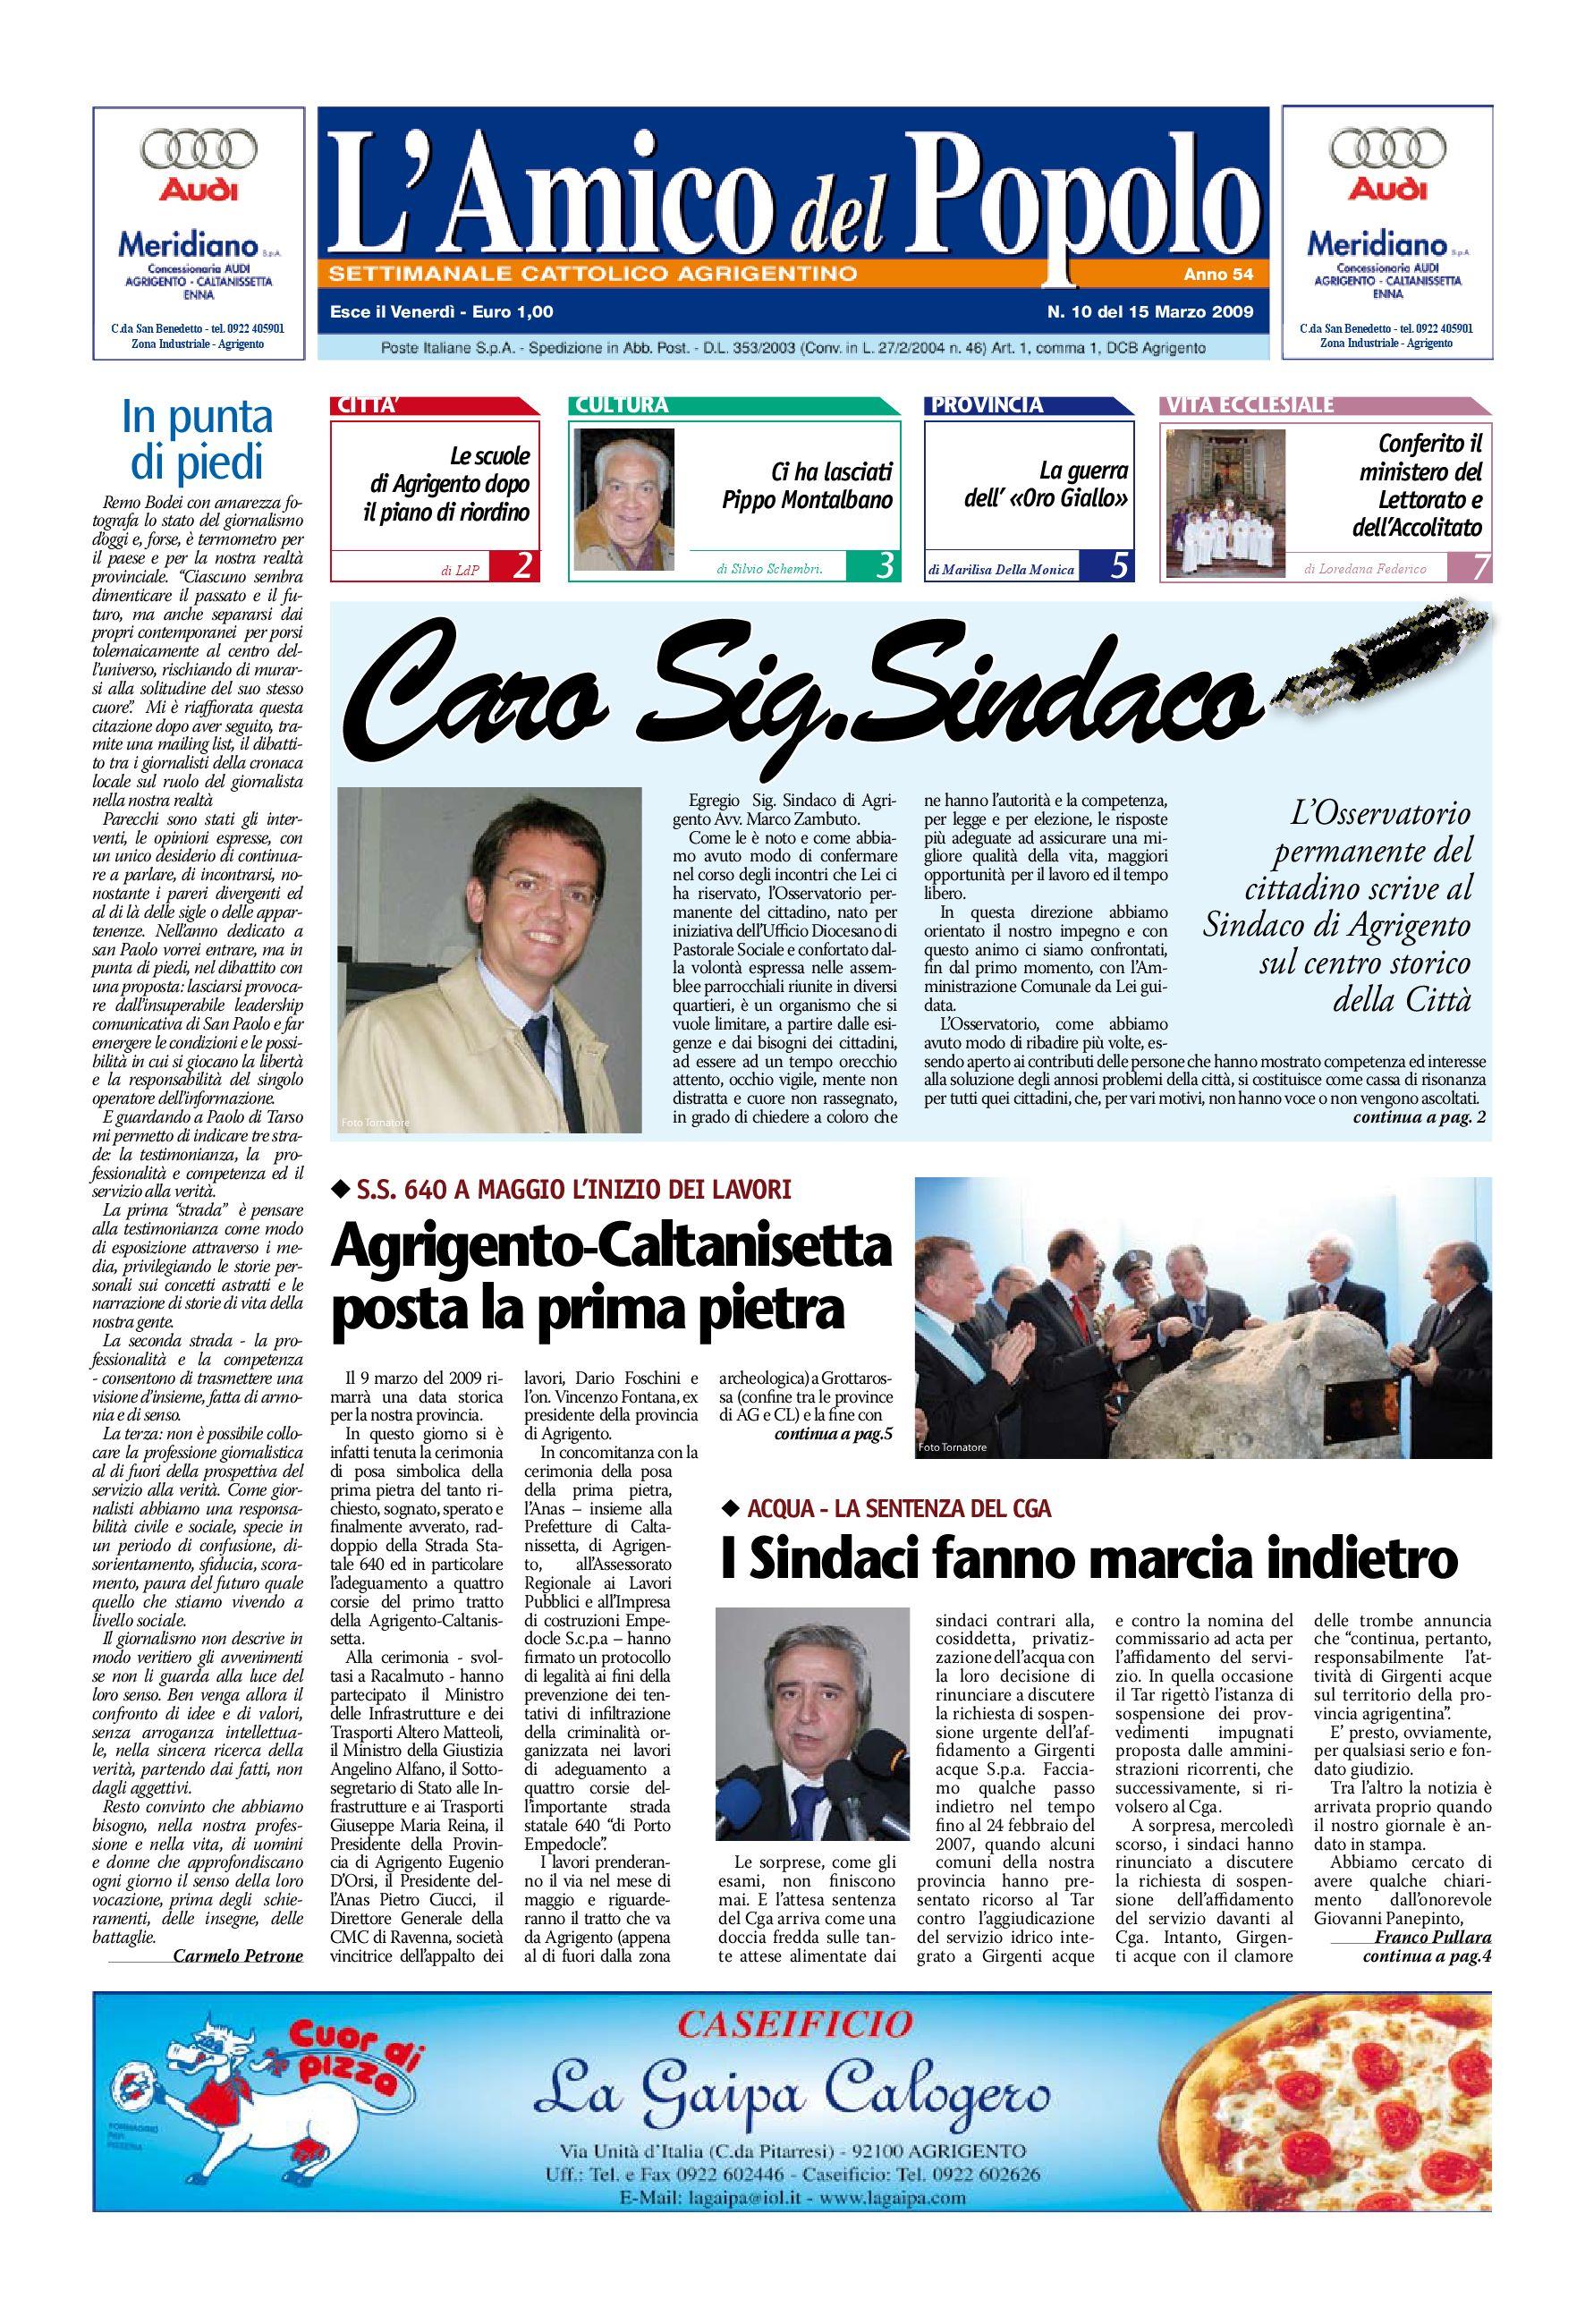 L Amico del Popolo by L Amico del Popolo Amico del Popolo - issuu c7796b9890c4